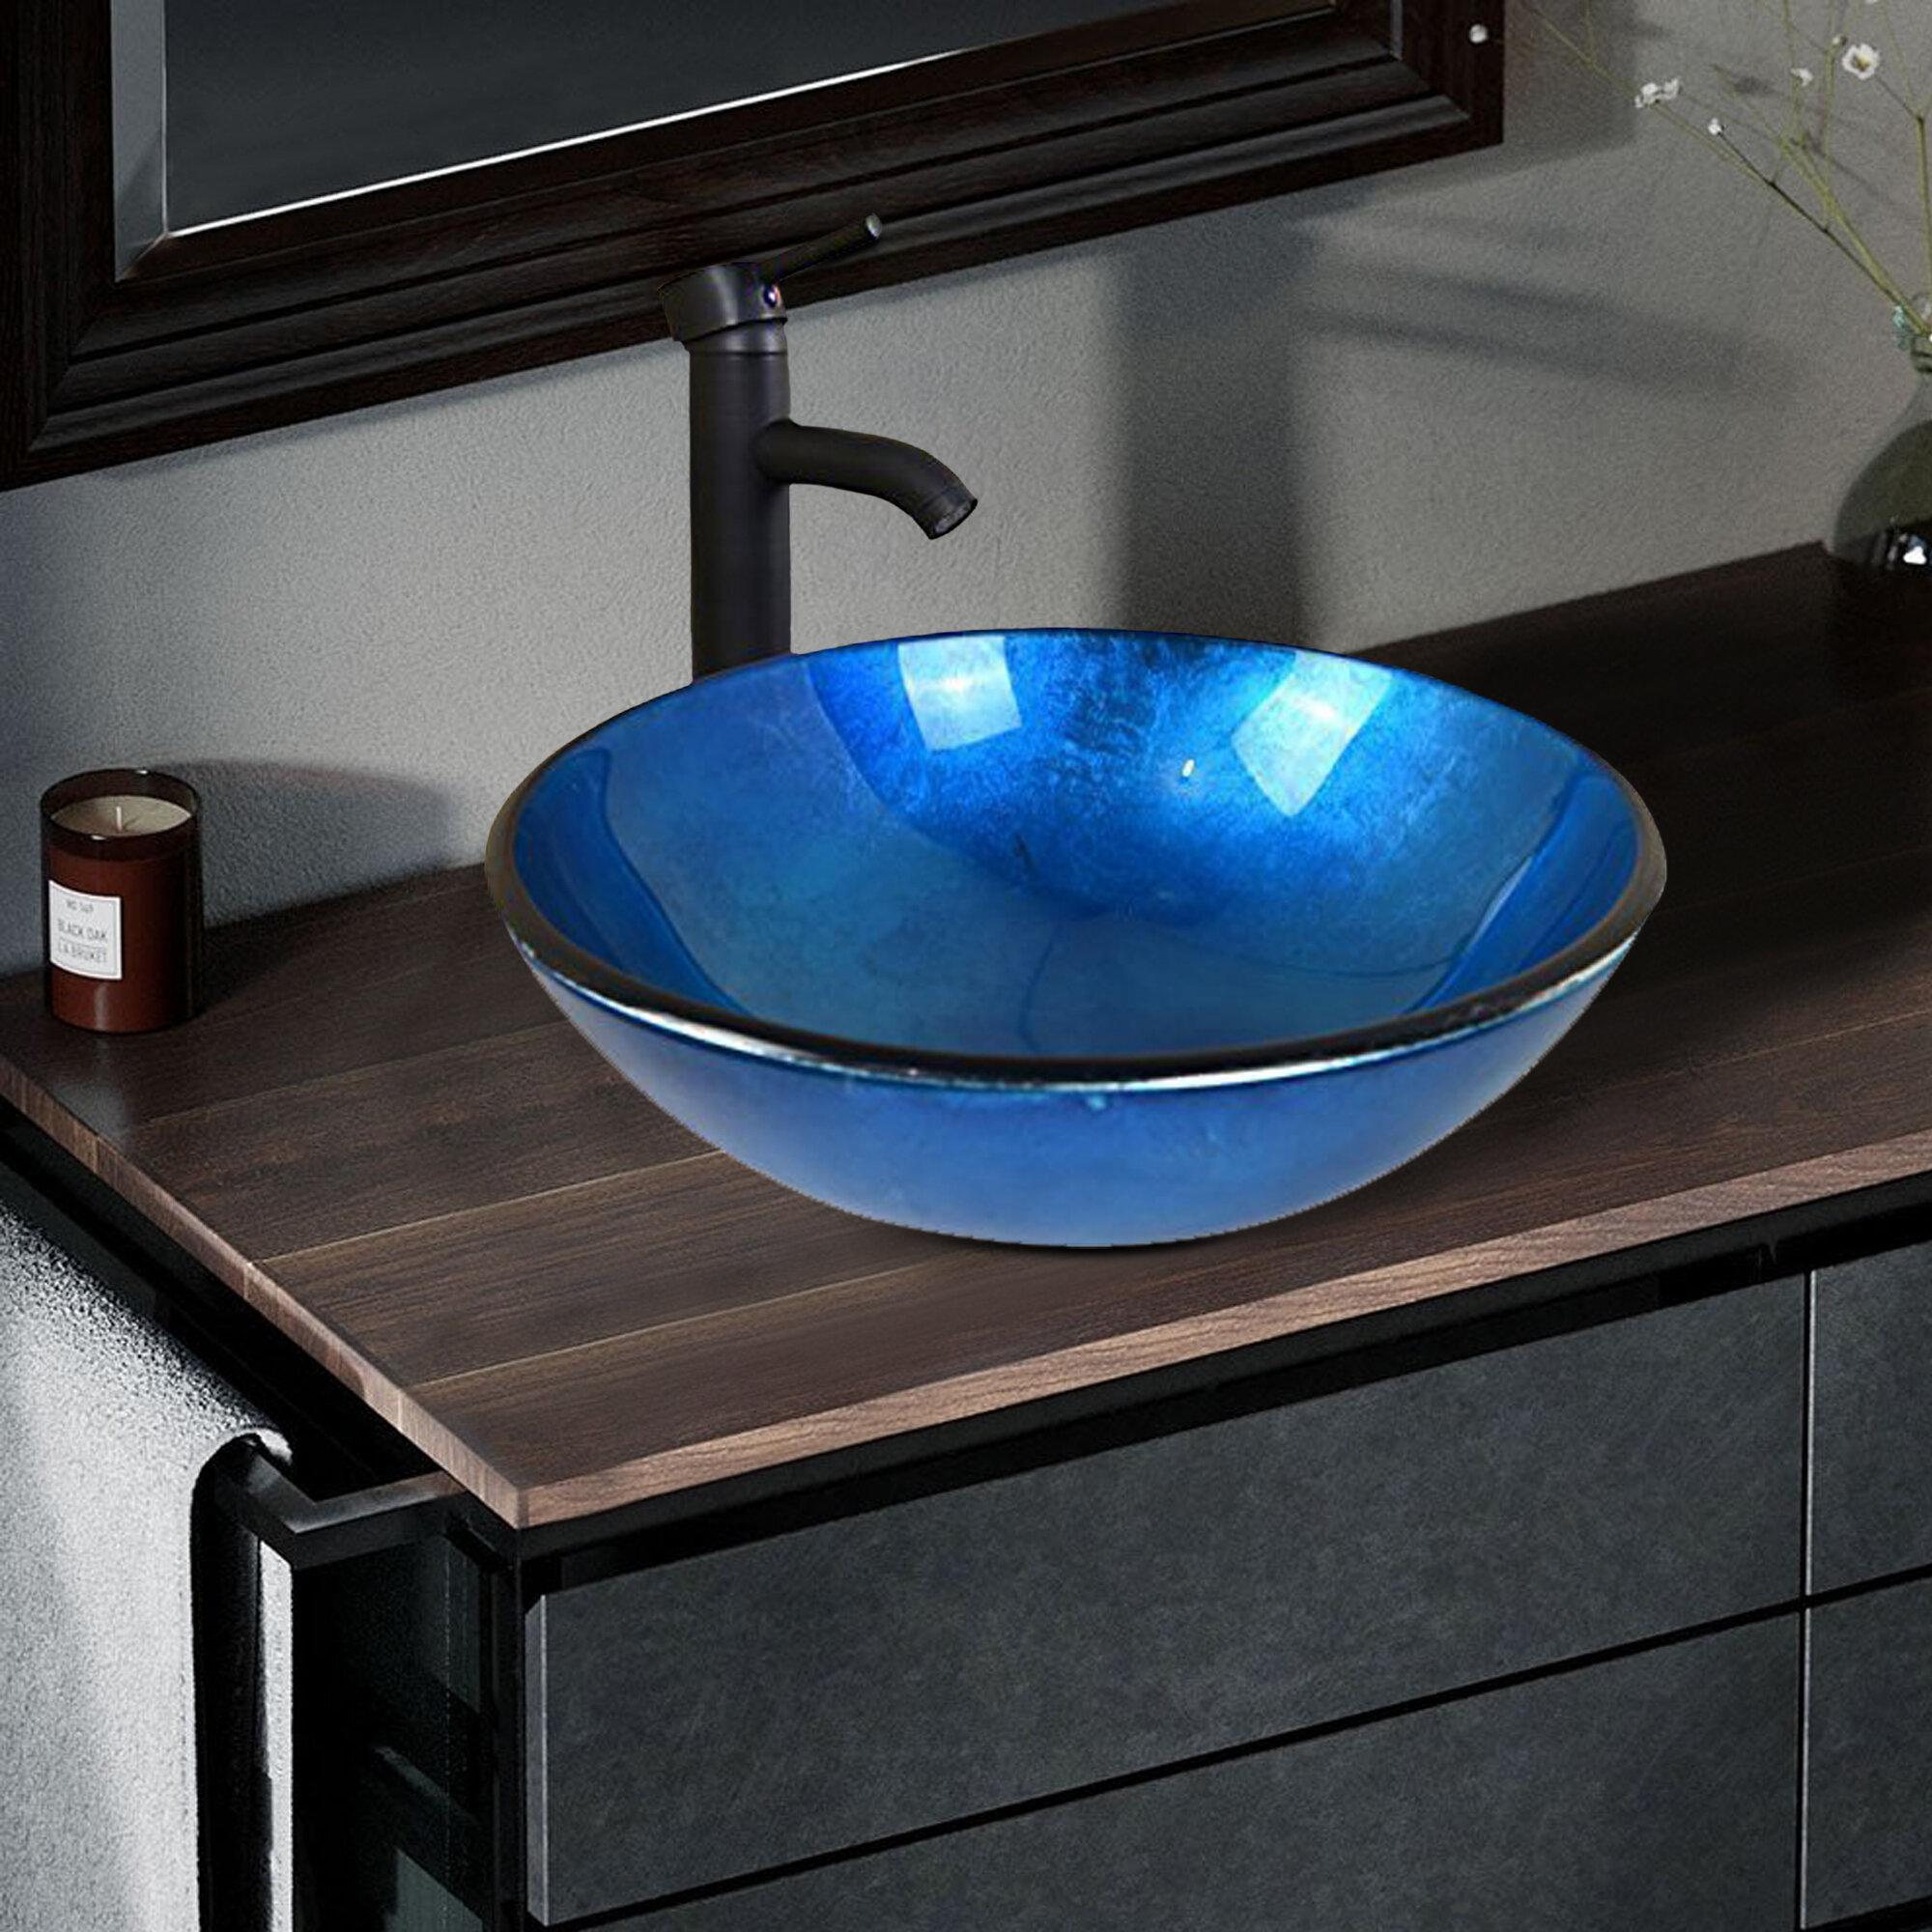 Flanna Tall Glass Circular Console Bathroom Sink With Faucet Wayfair